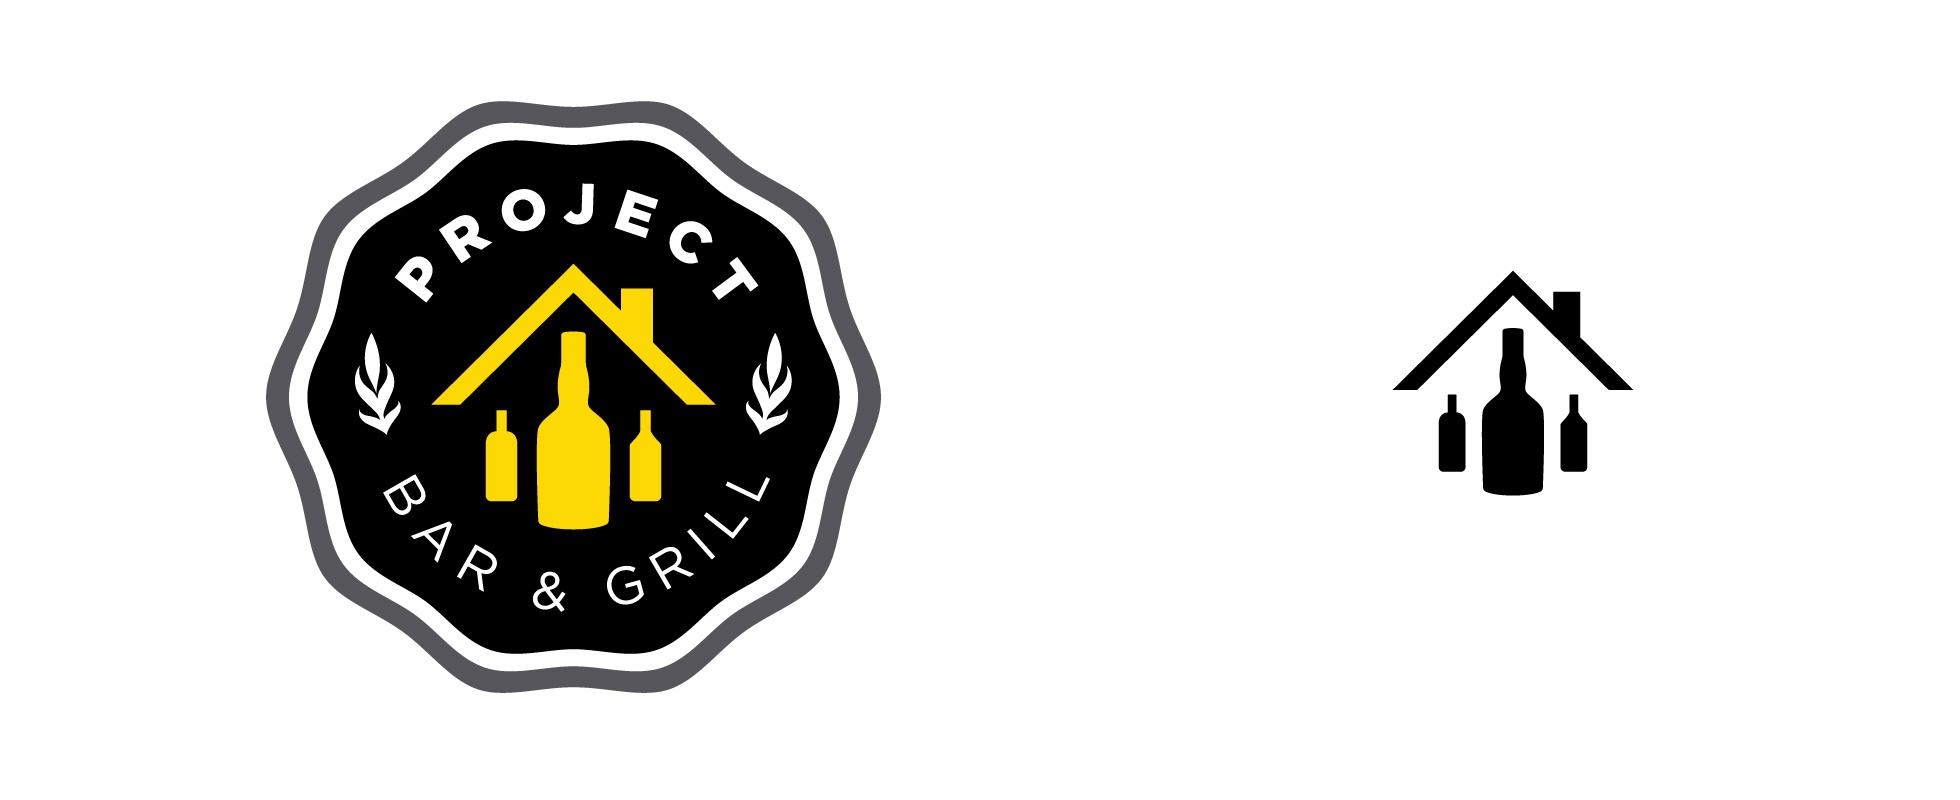 Project_bar&grill-01.jpg